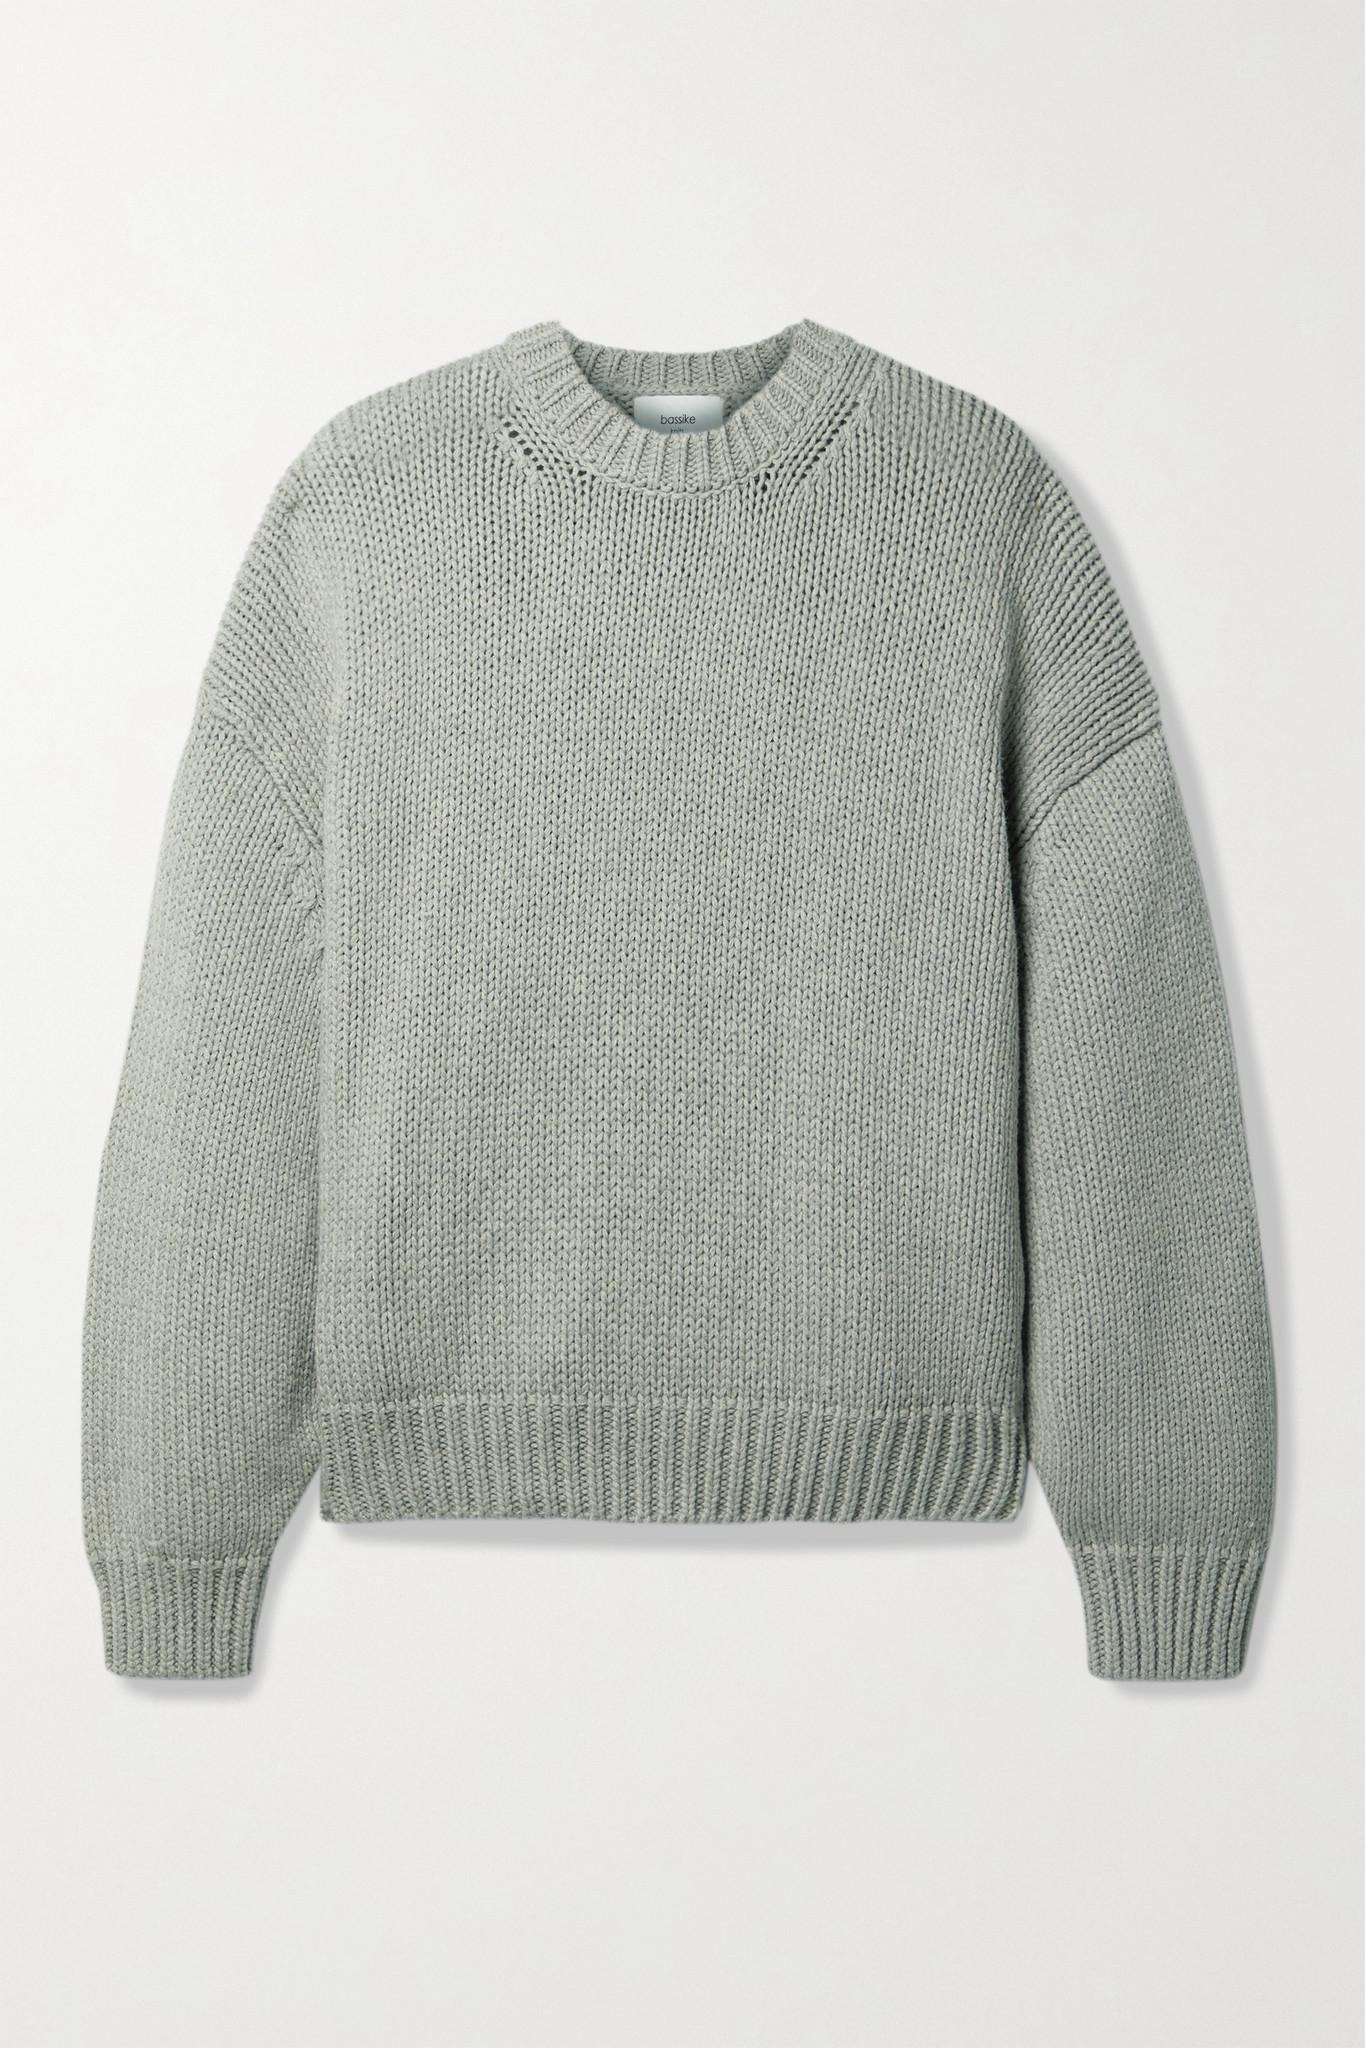 BASSIKE - 大廓形棉质美利奴羊毛混纺毛衣 - 灰色 - 1